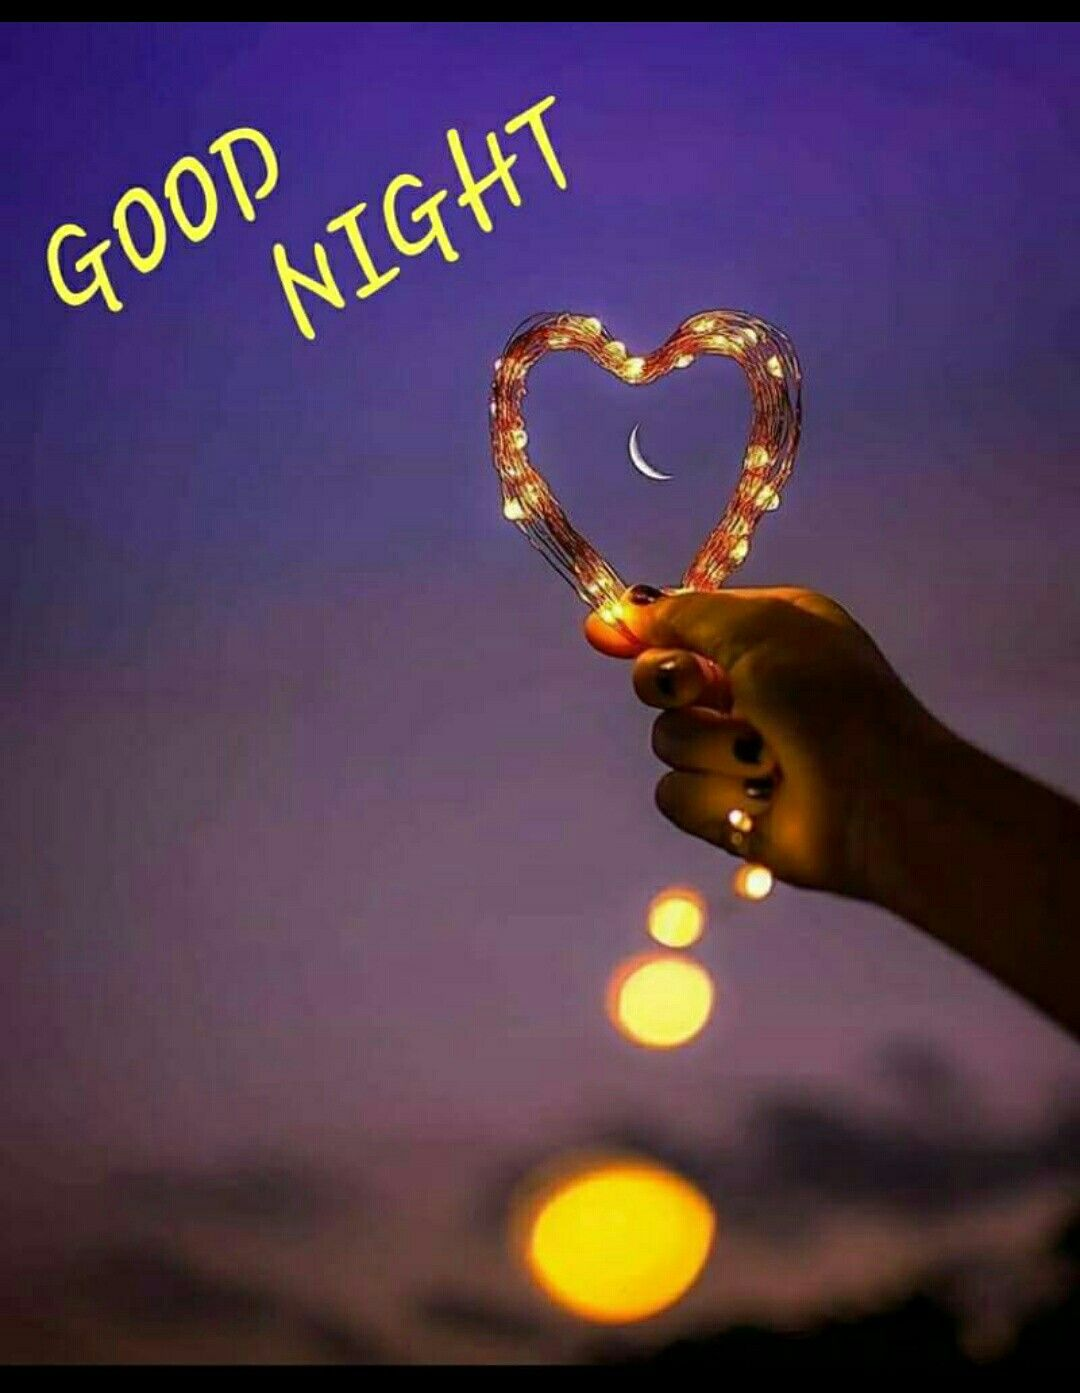 Sweet dreams | GOODNIGHT 2 | Good night image, Good night